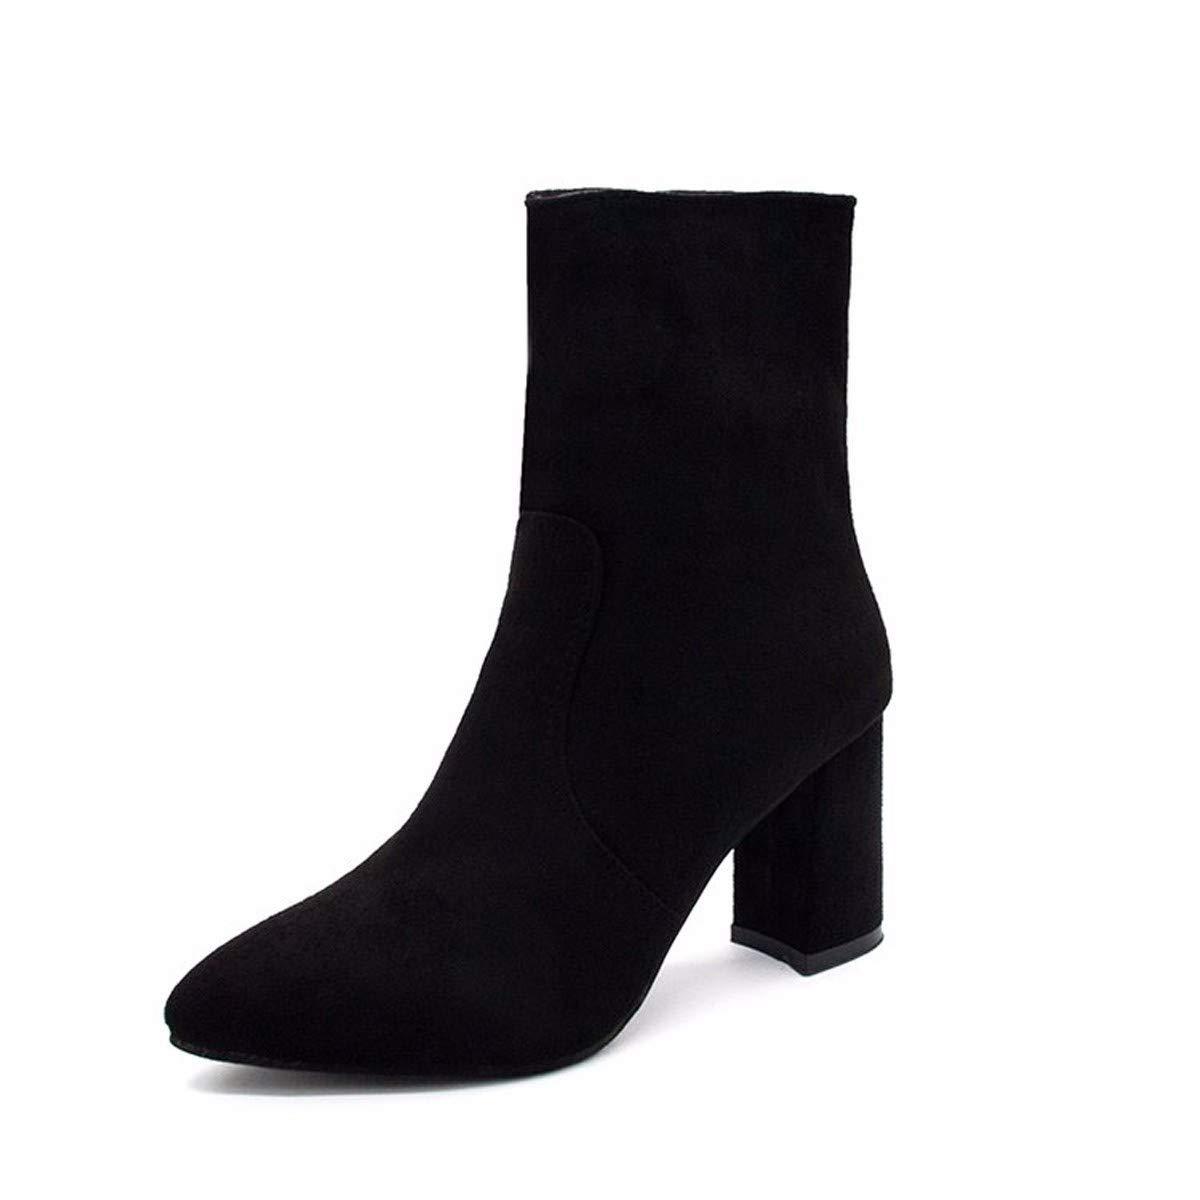 HBDLH Damenschuhe Baitao Wildleder 8Cm Heel Stiefel Spitz Modisch Modisch Modisch Martin Stiefeln Dicken Heels Stiefel Mitte 2792eb